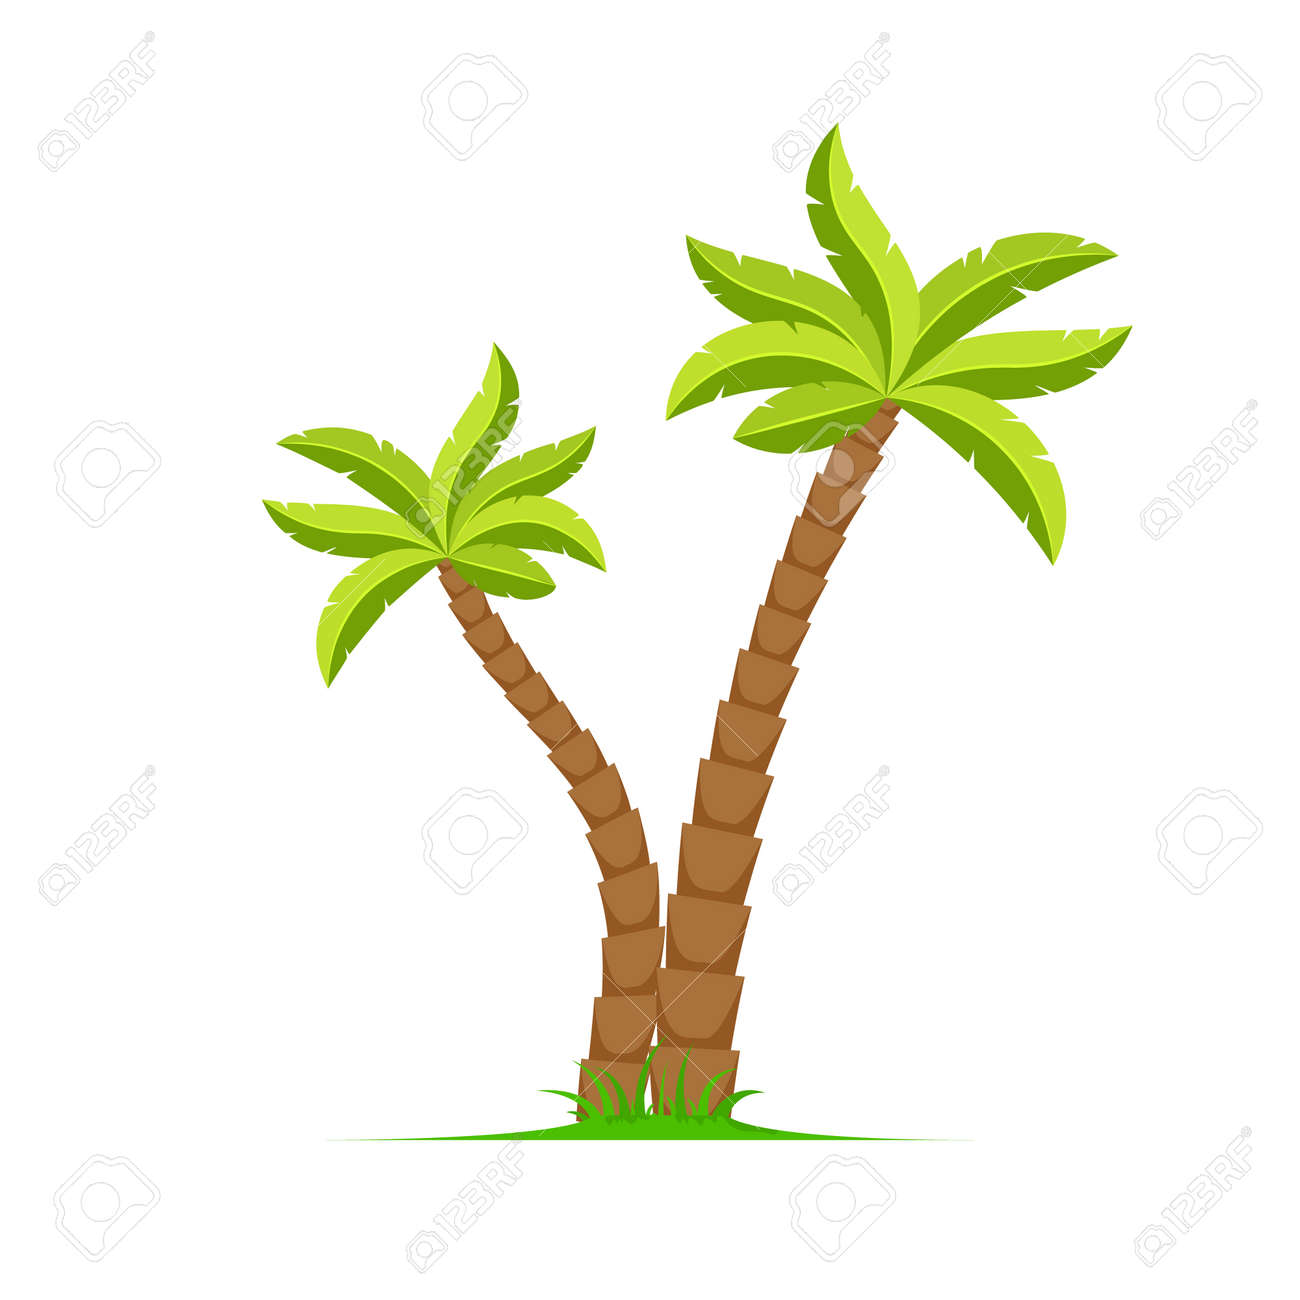 Palm tree vector island coconut cartoon icon. Palmtree island desert isolated tropical icon - 168952928